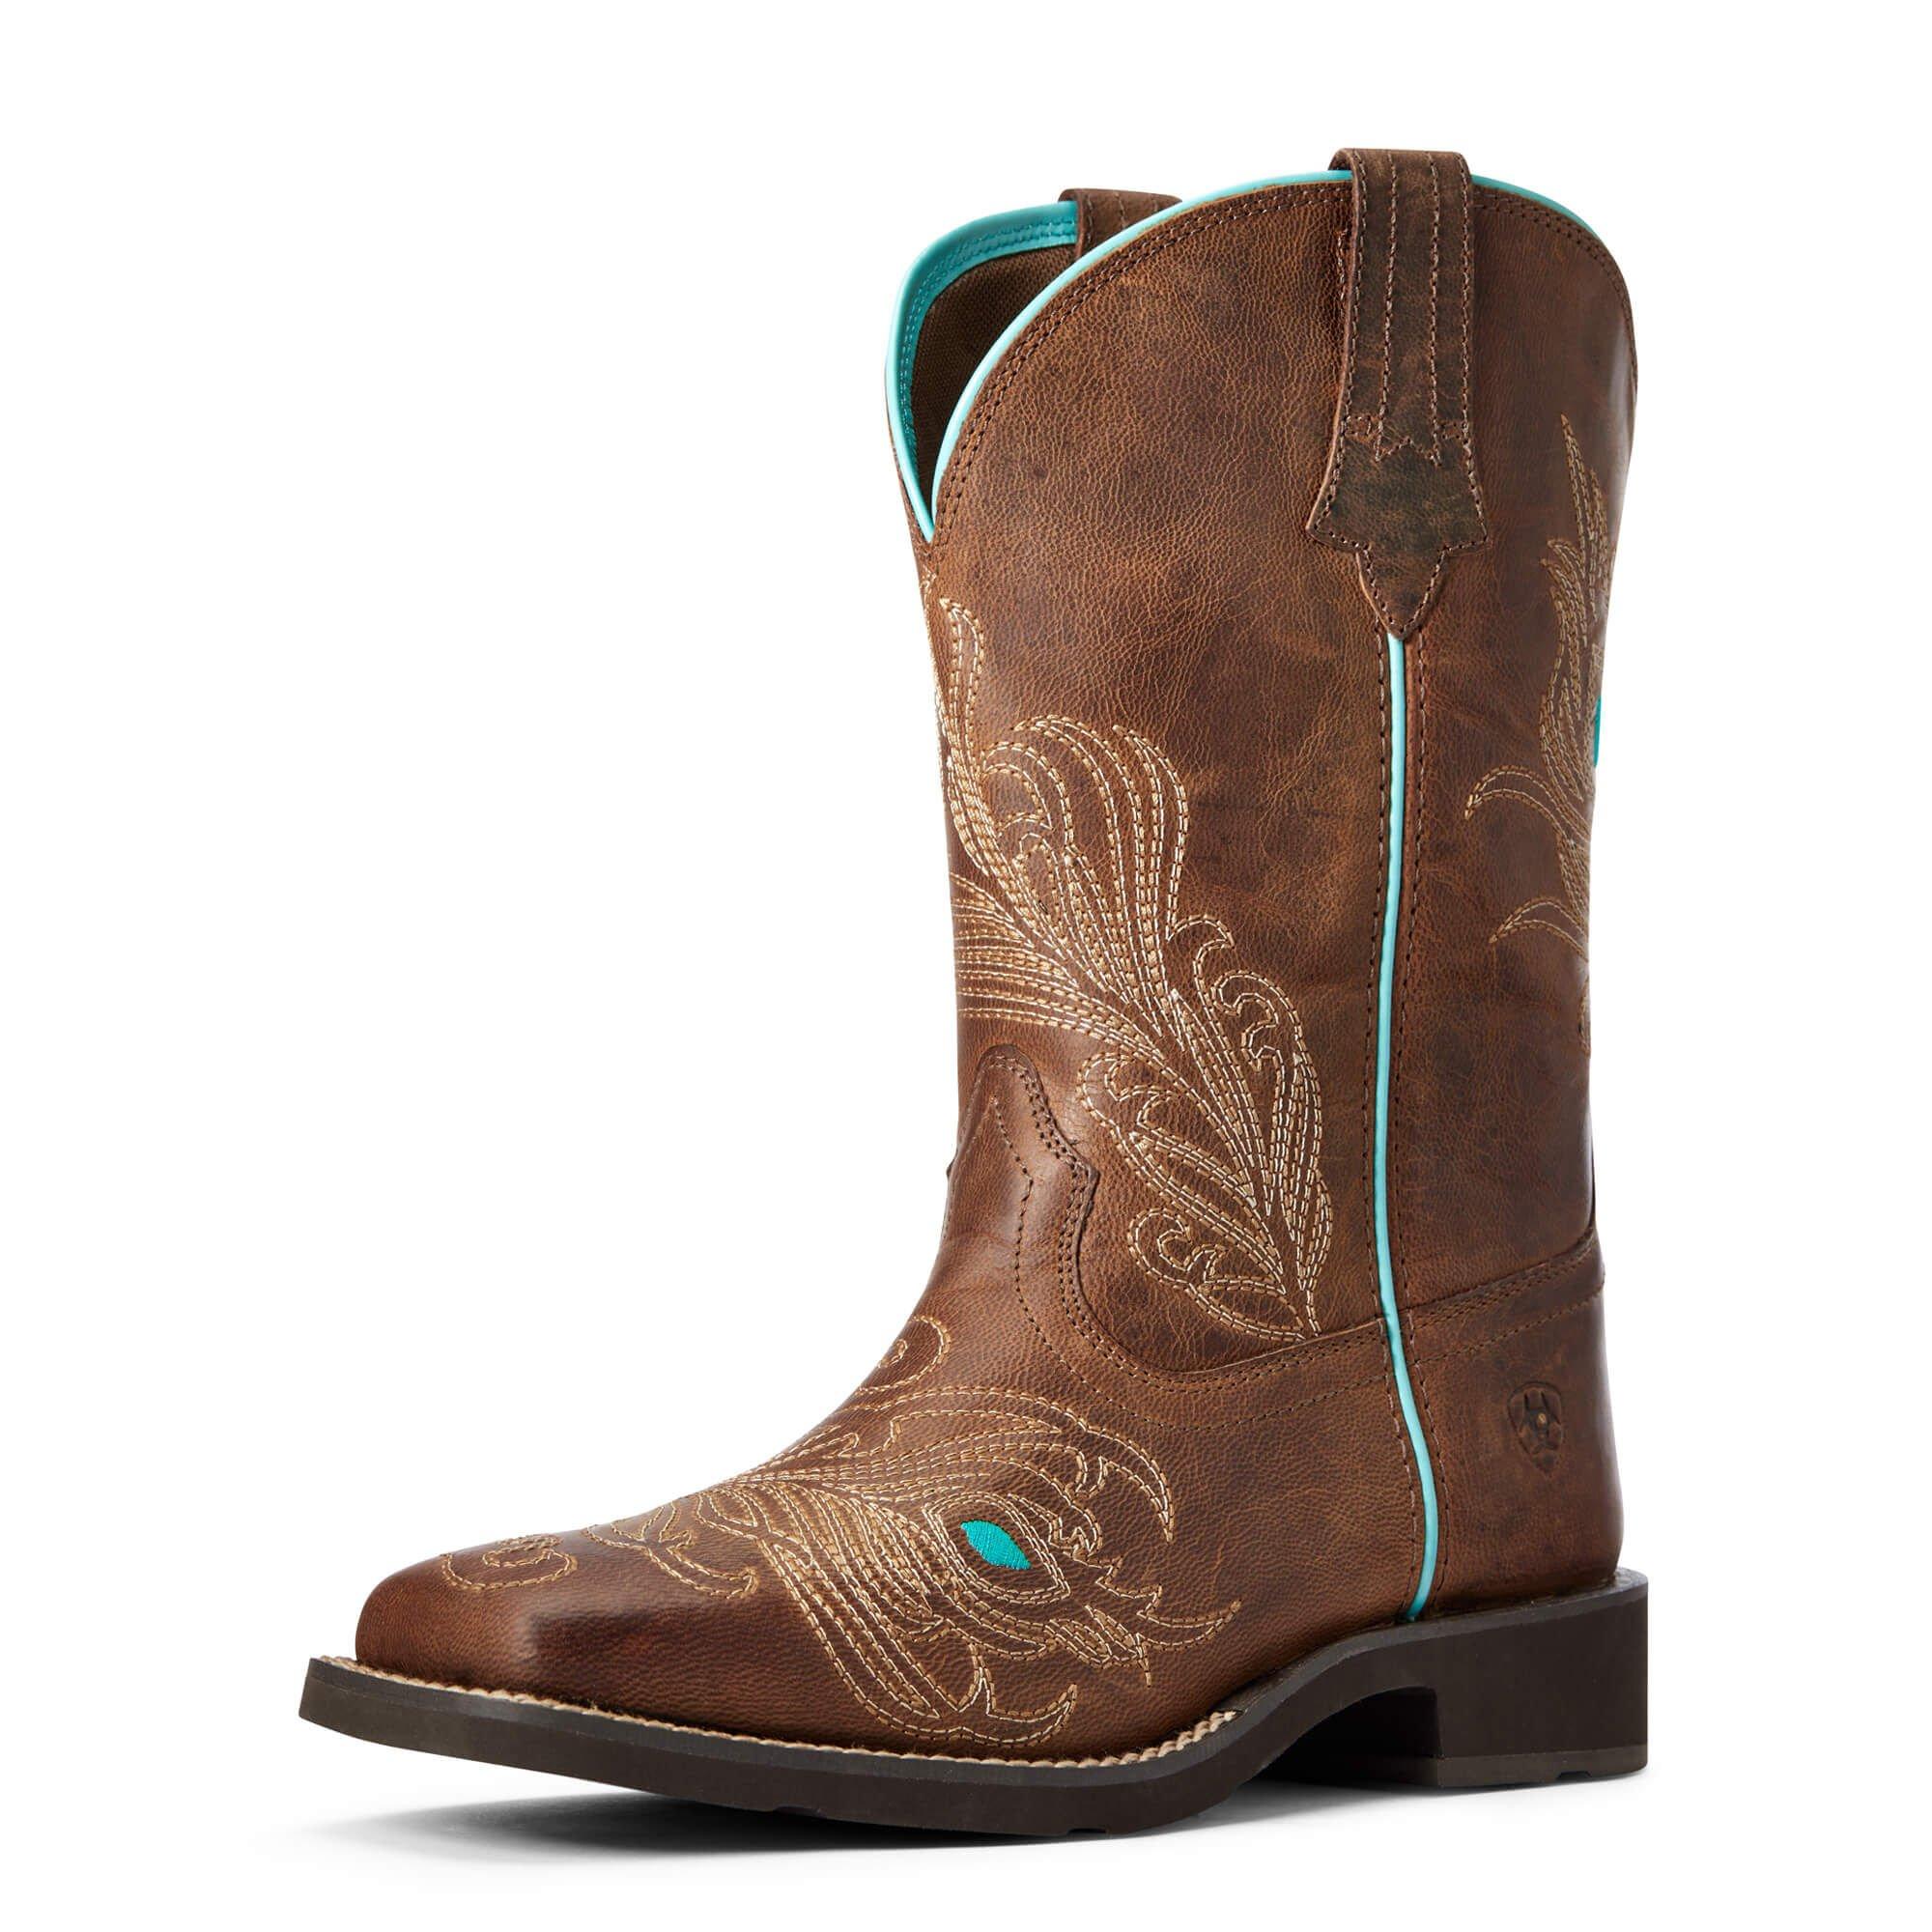 Bright Eyes II Western Boot